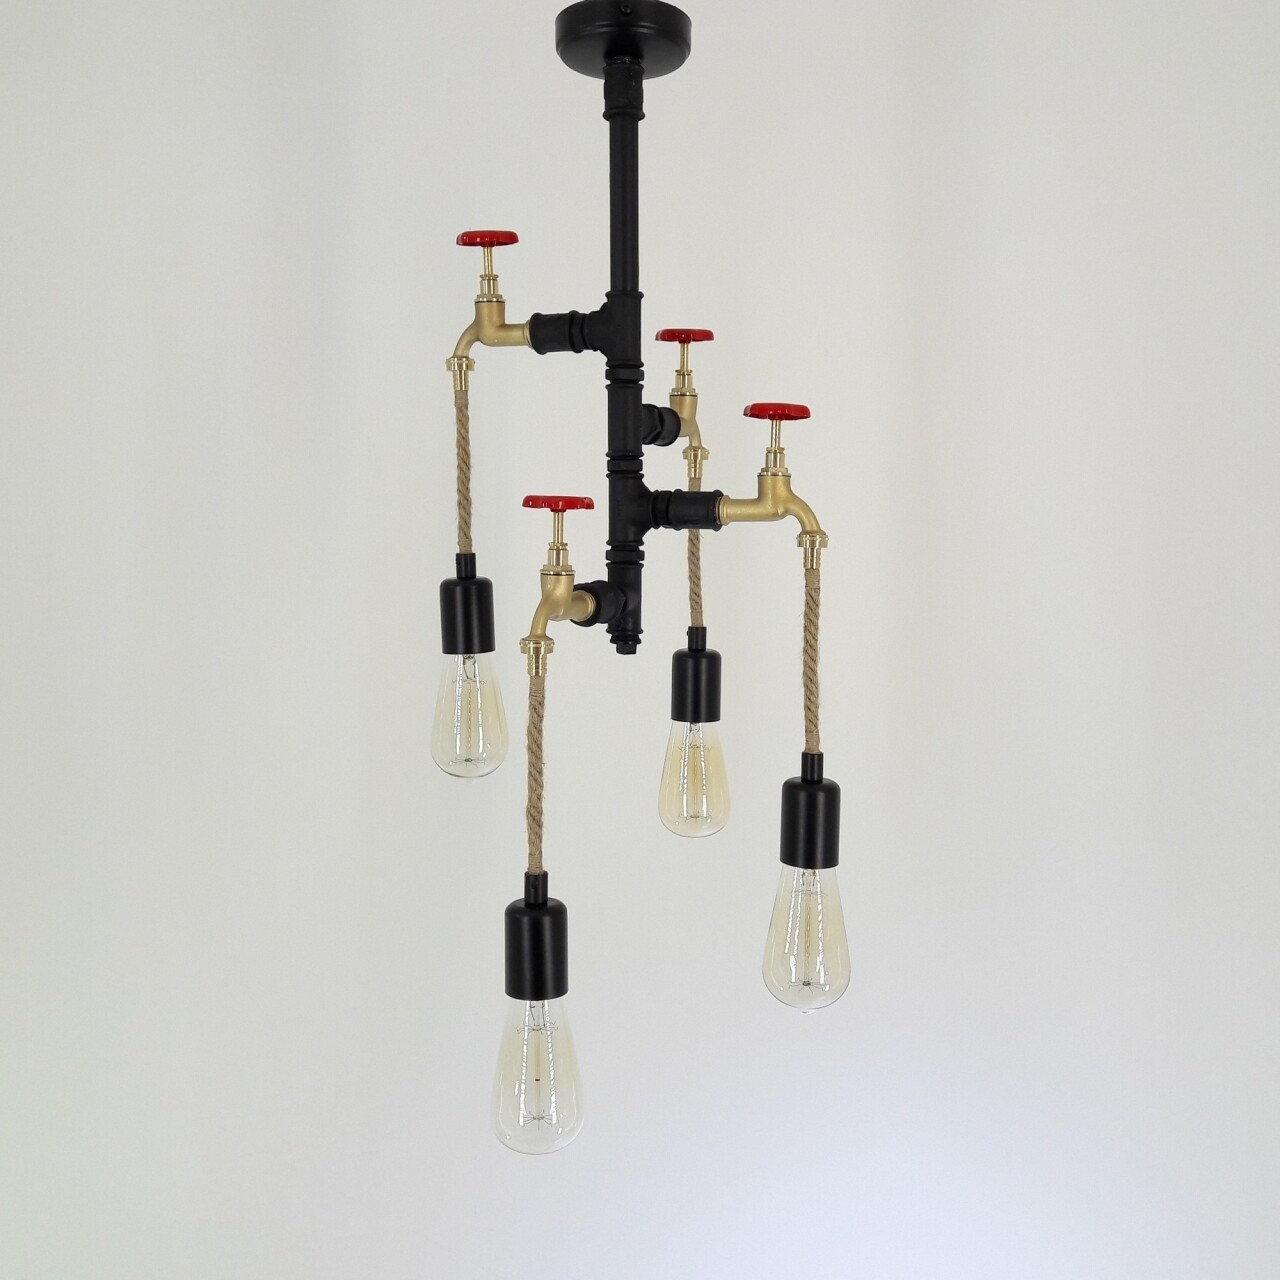 Candelabru All Design, metal, 60x33x33 cm, Black